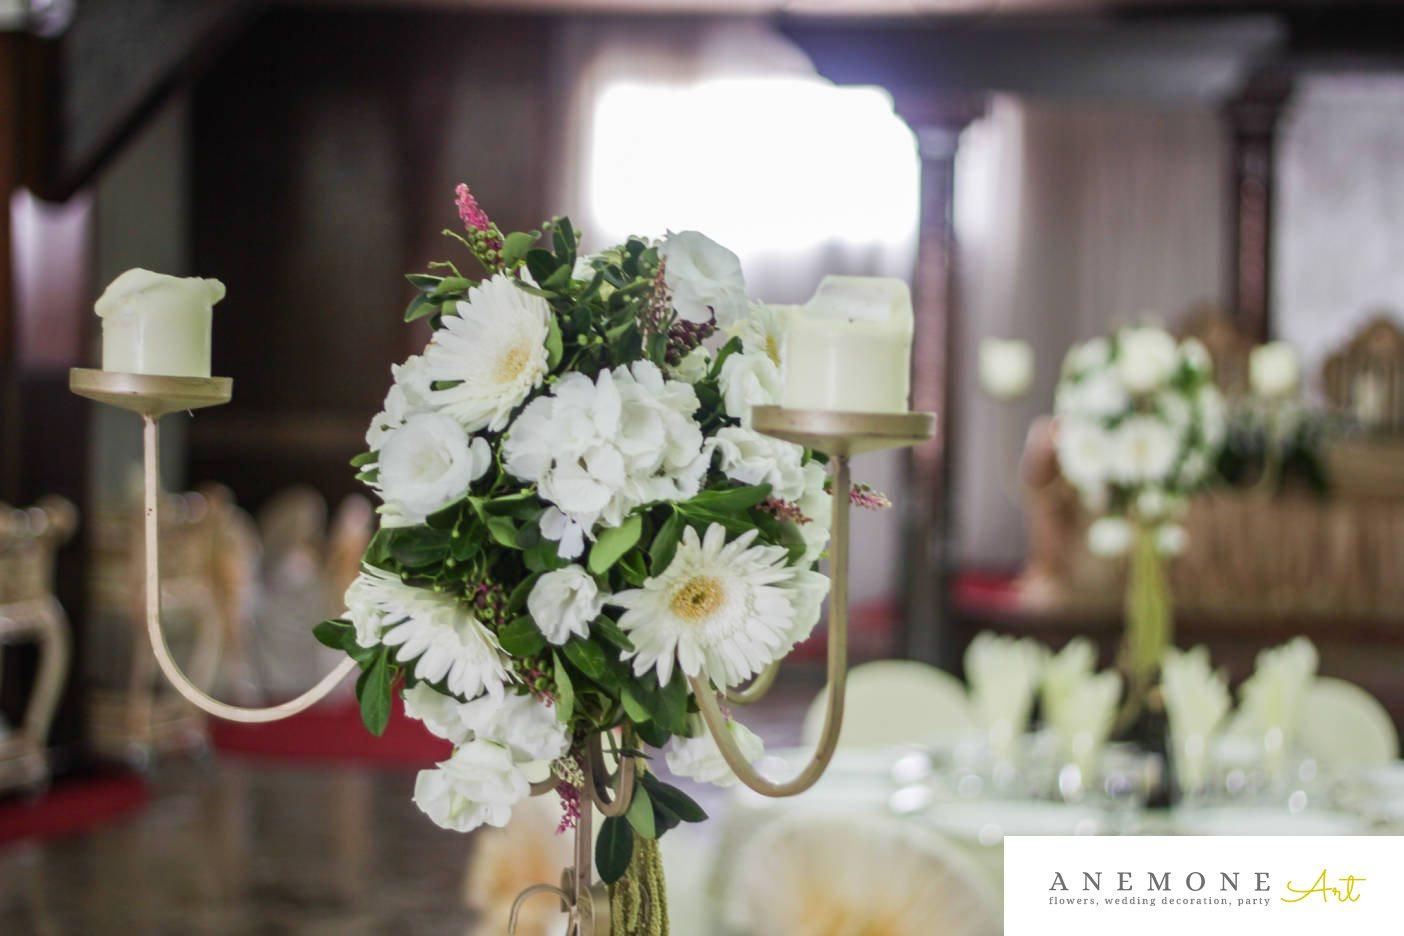 Poza, foto cu Flori de nunta alb, decor masa, gerbera, hortensia, lisianthus, lumanare, verde in Arad, Timisoara, Oradea (wedding flowers, bouquets) nunta Arad, Timisoara, Oradea